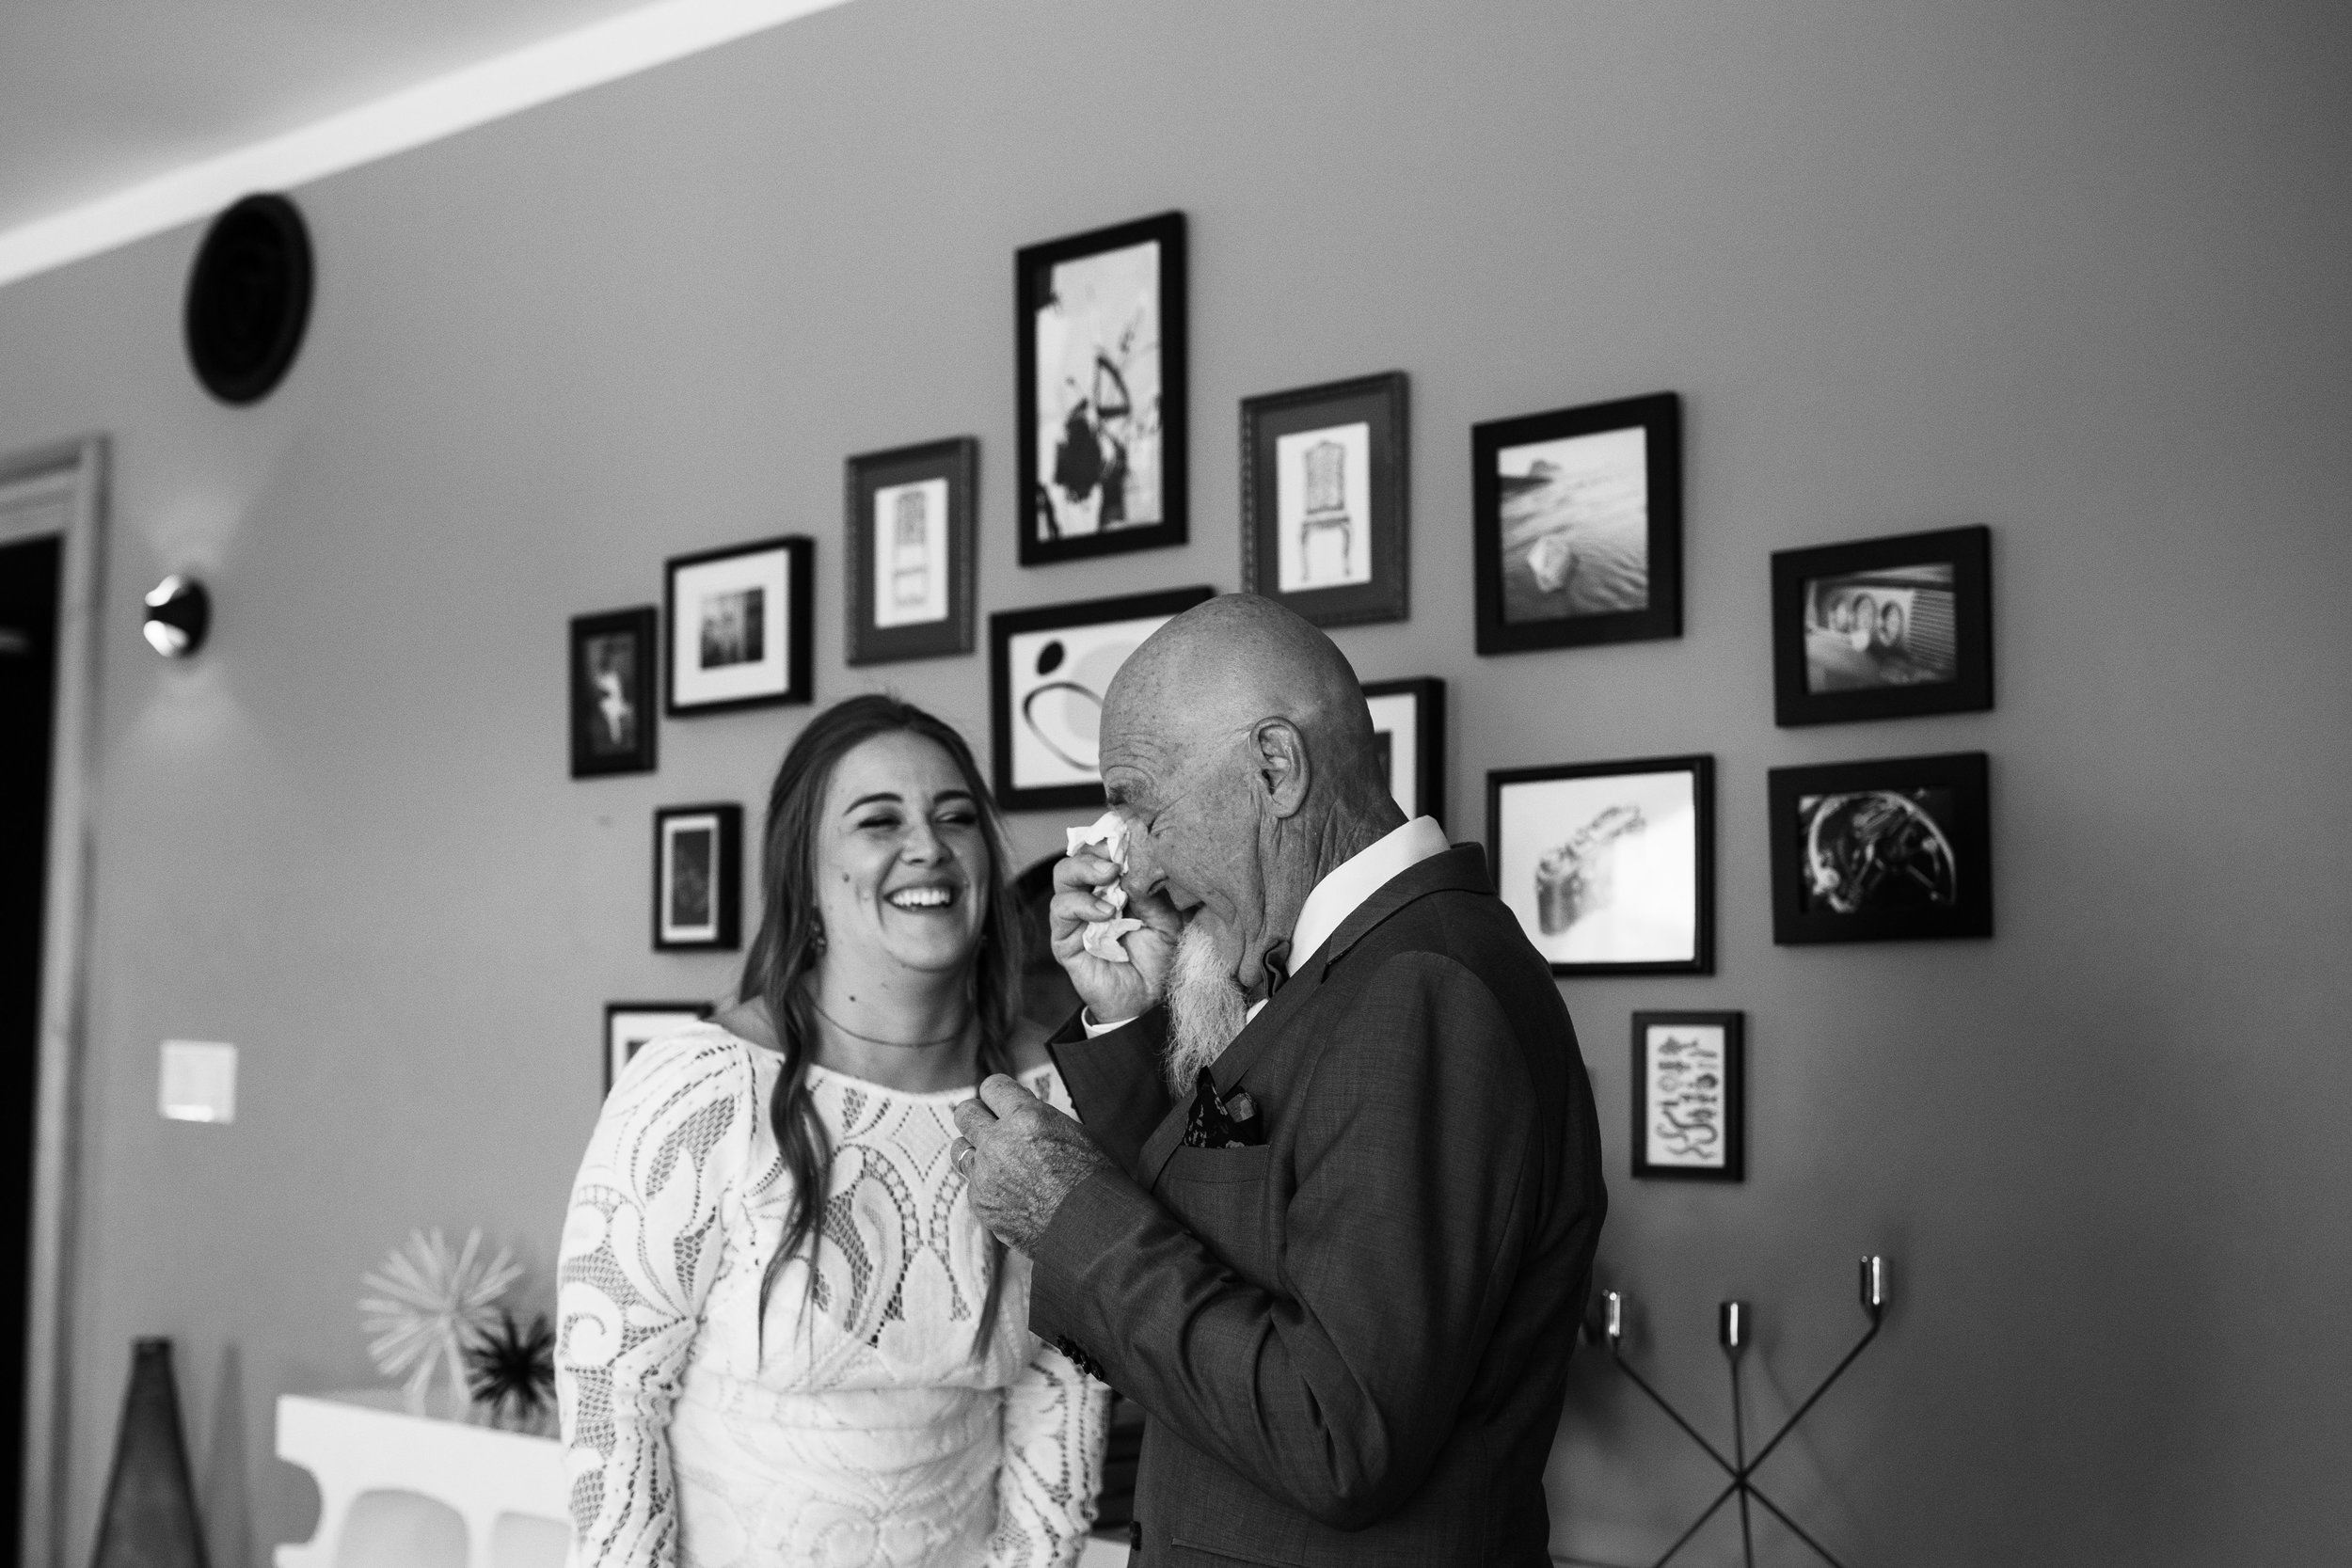 Tumbleweed-Sanctuary-Wedding-First-Look-With-Dad (3).jpg